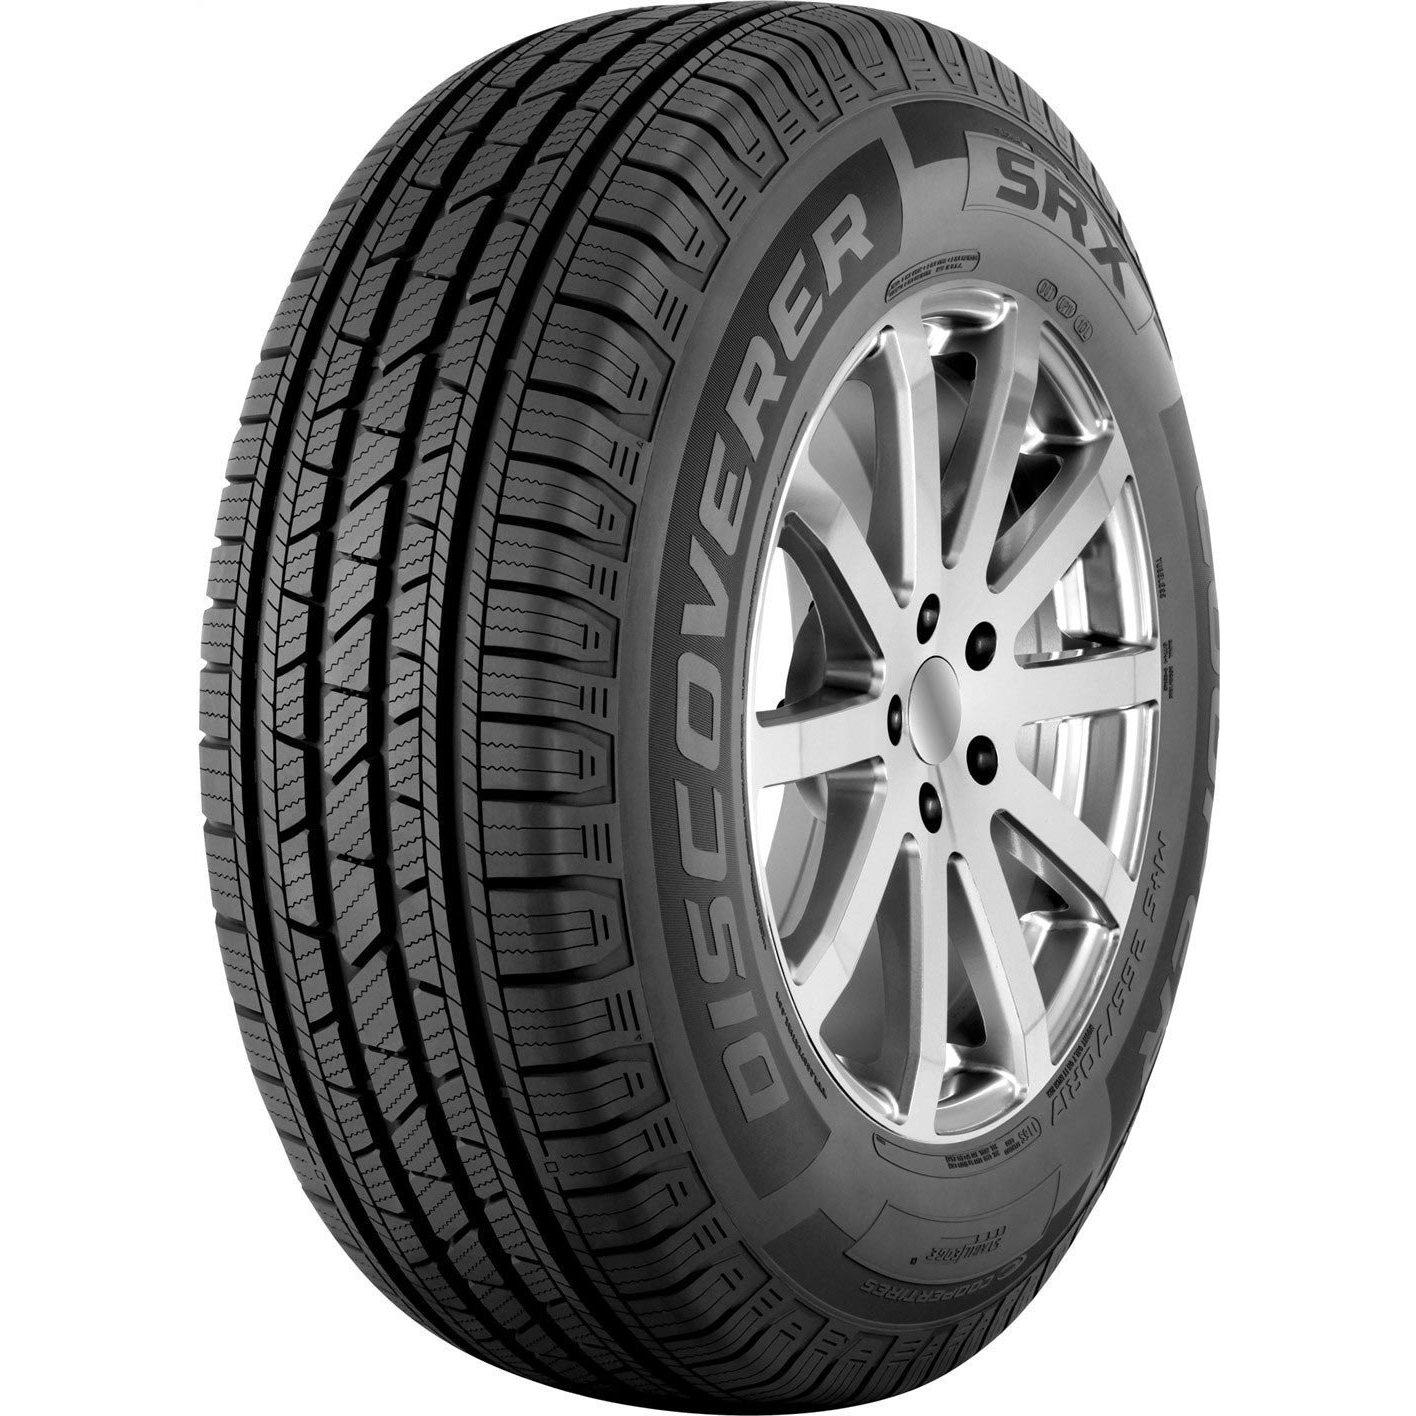 COOPER Discoverer SRX All Season Tire - 245/65R17 107T (B...